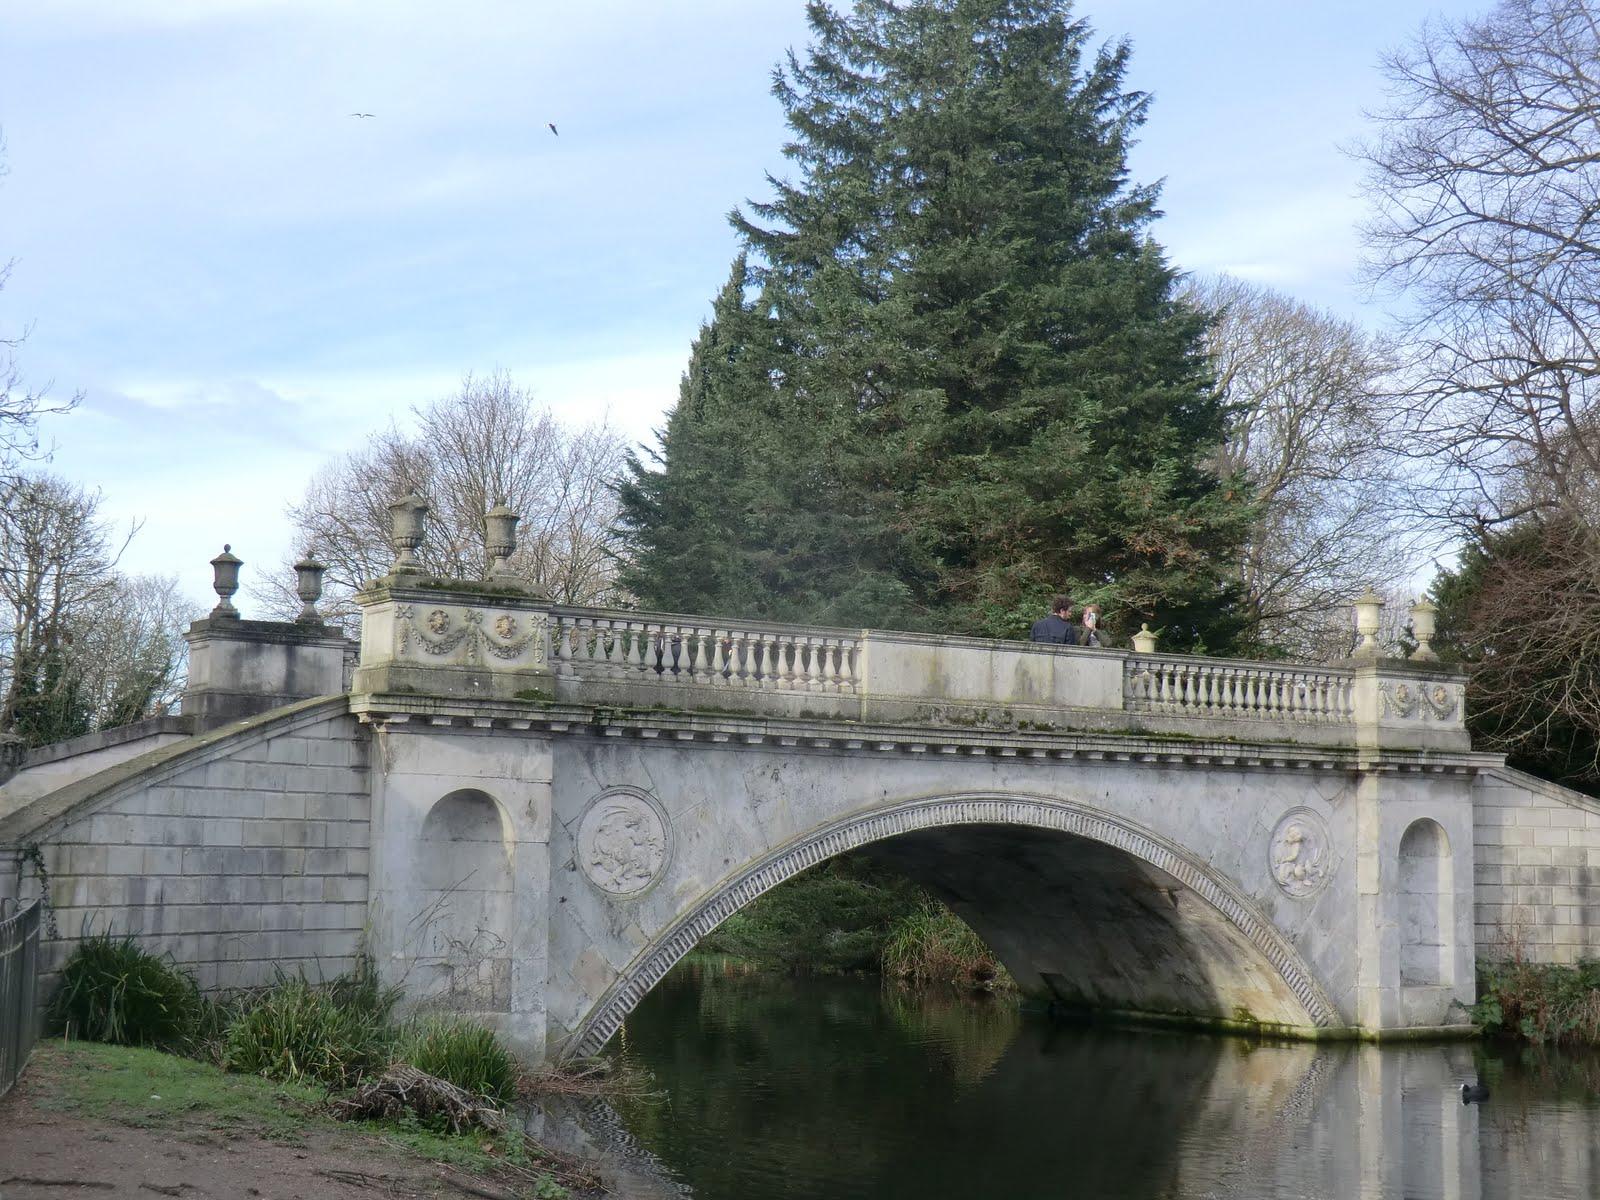 CIMG2120 Classic Bridge, Chiswick House